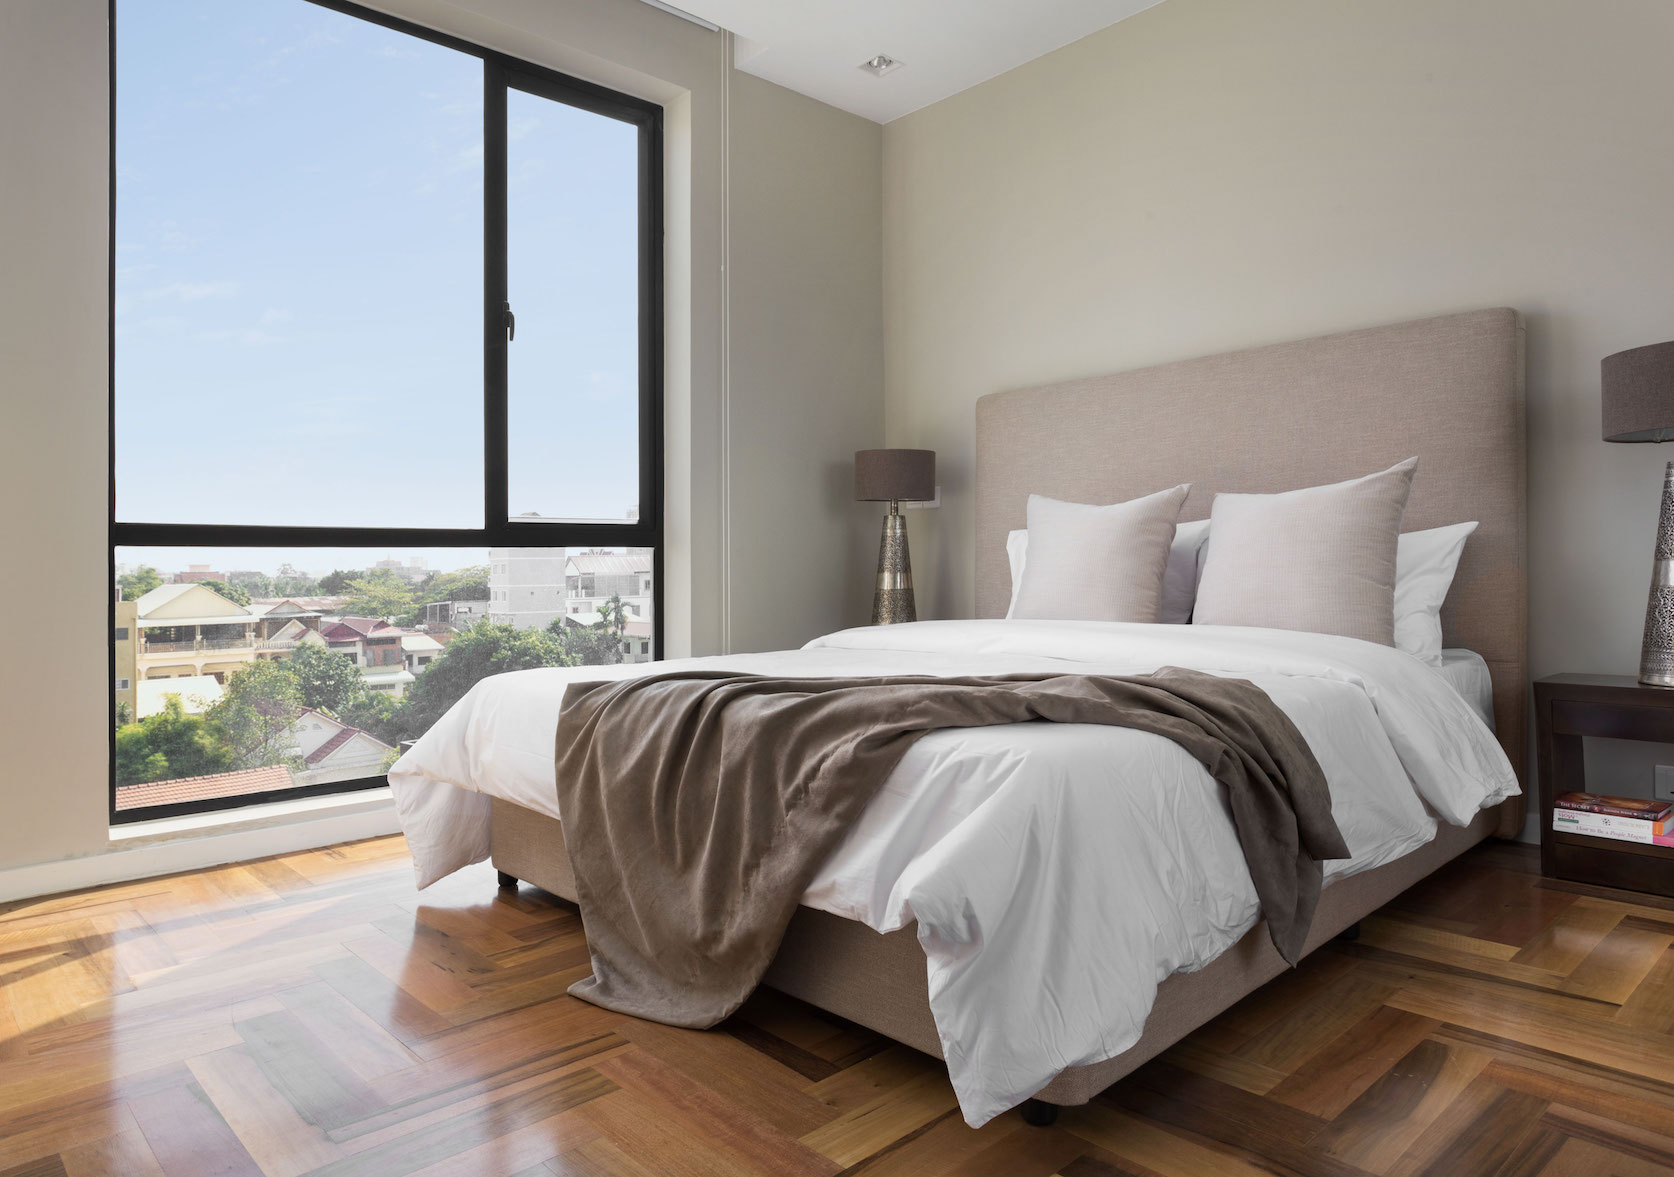 3-bedroom-duplex-spare-room-habitat-condos-family-property-phnom-penh.jpg